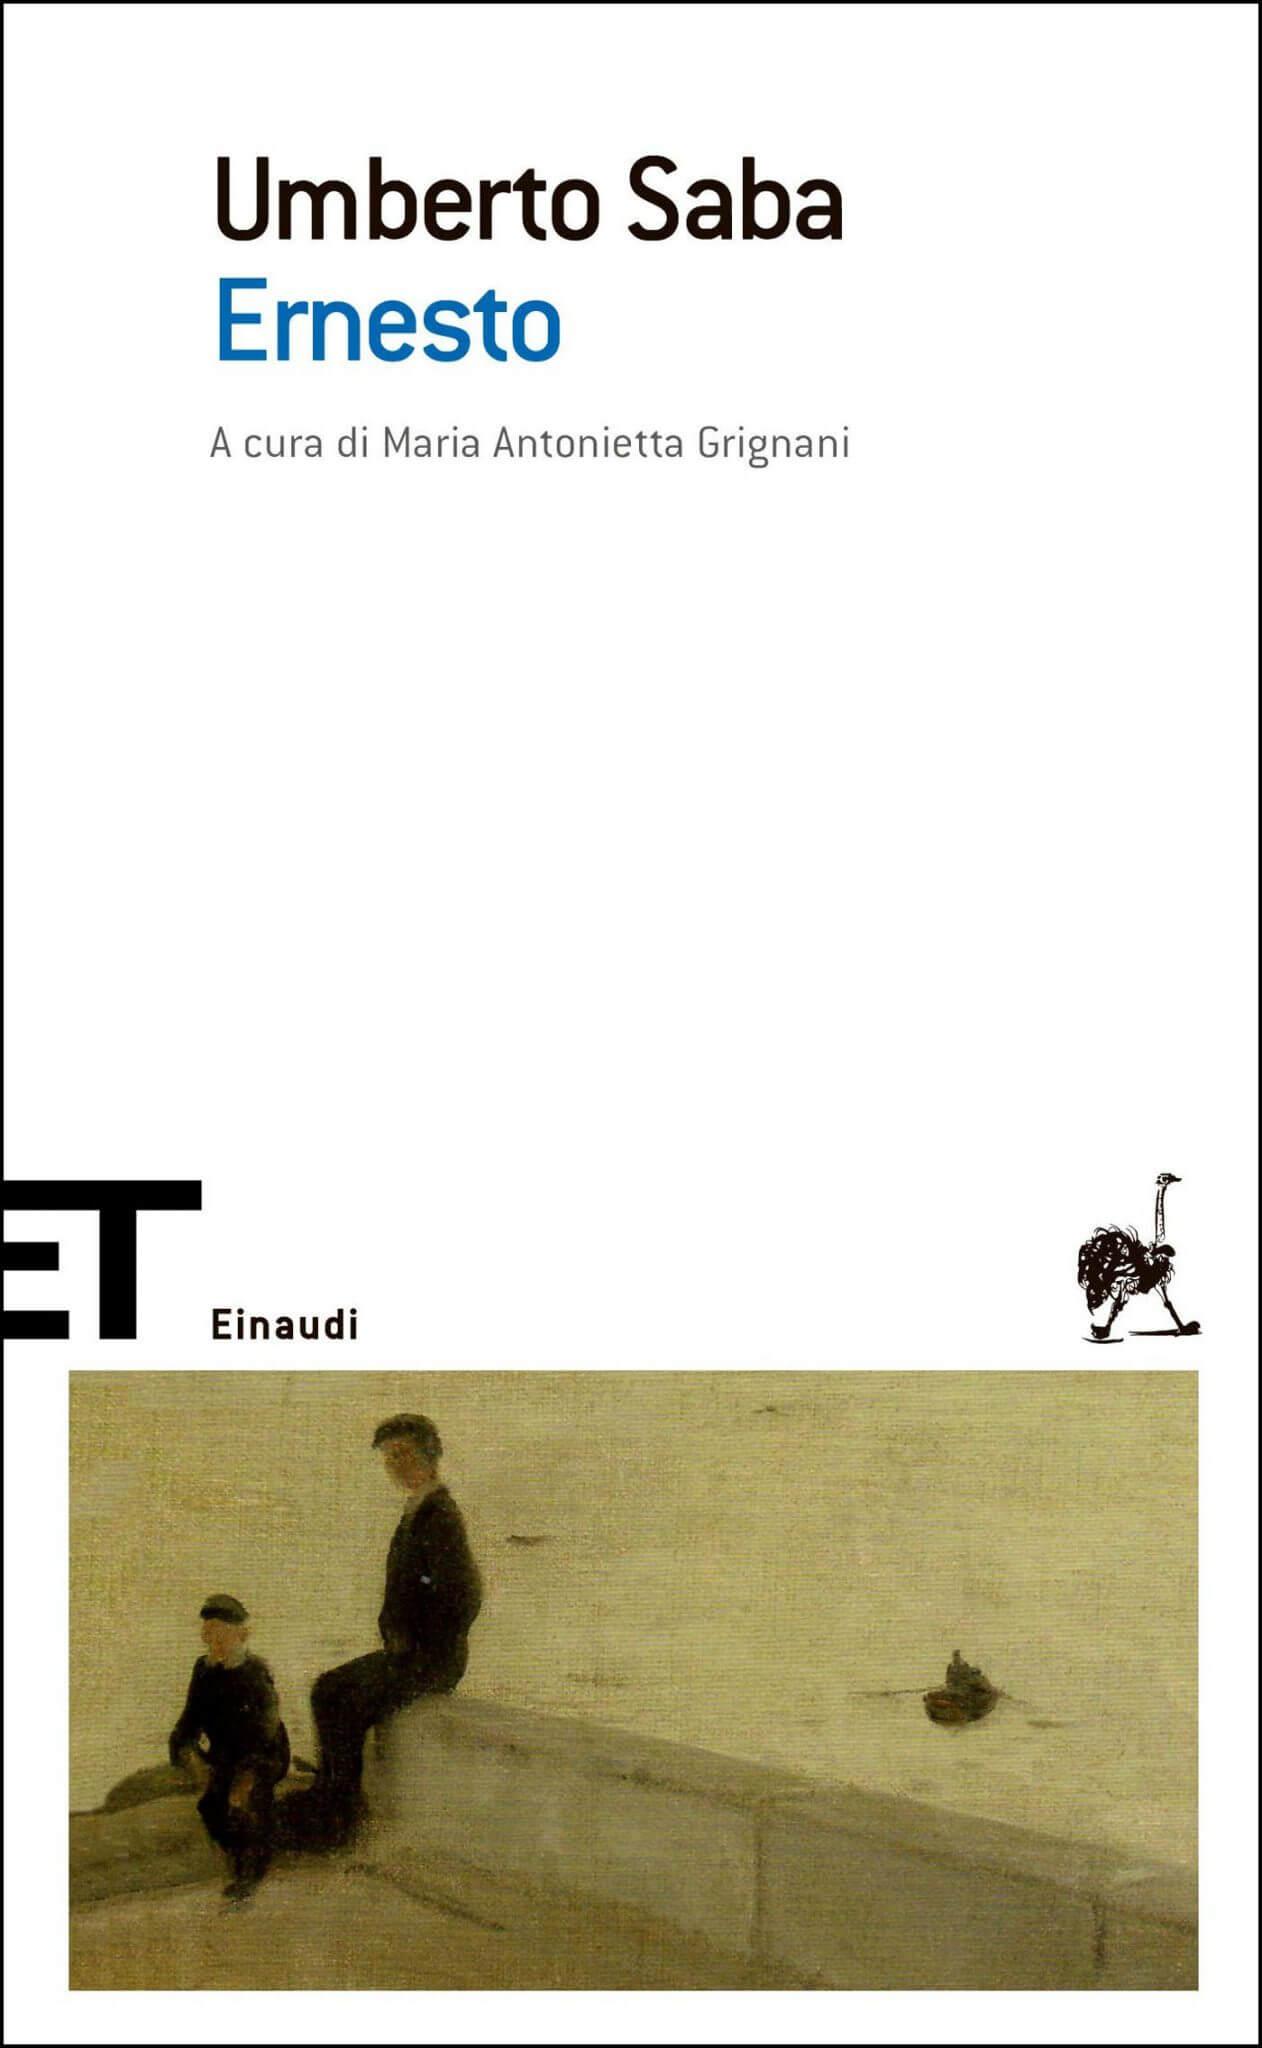 Ernesto - Umberto Saba